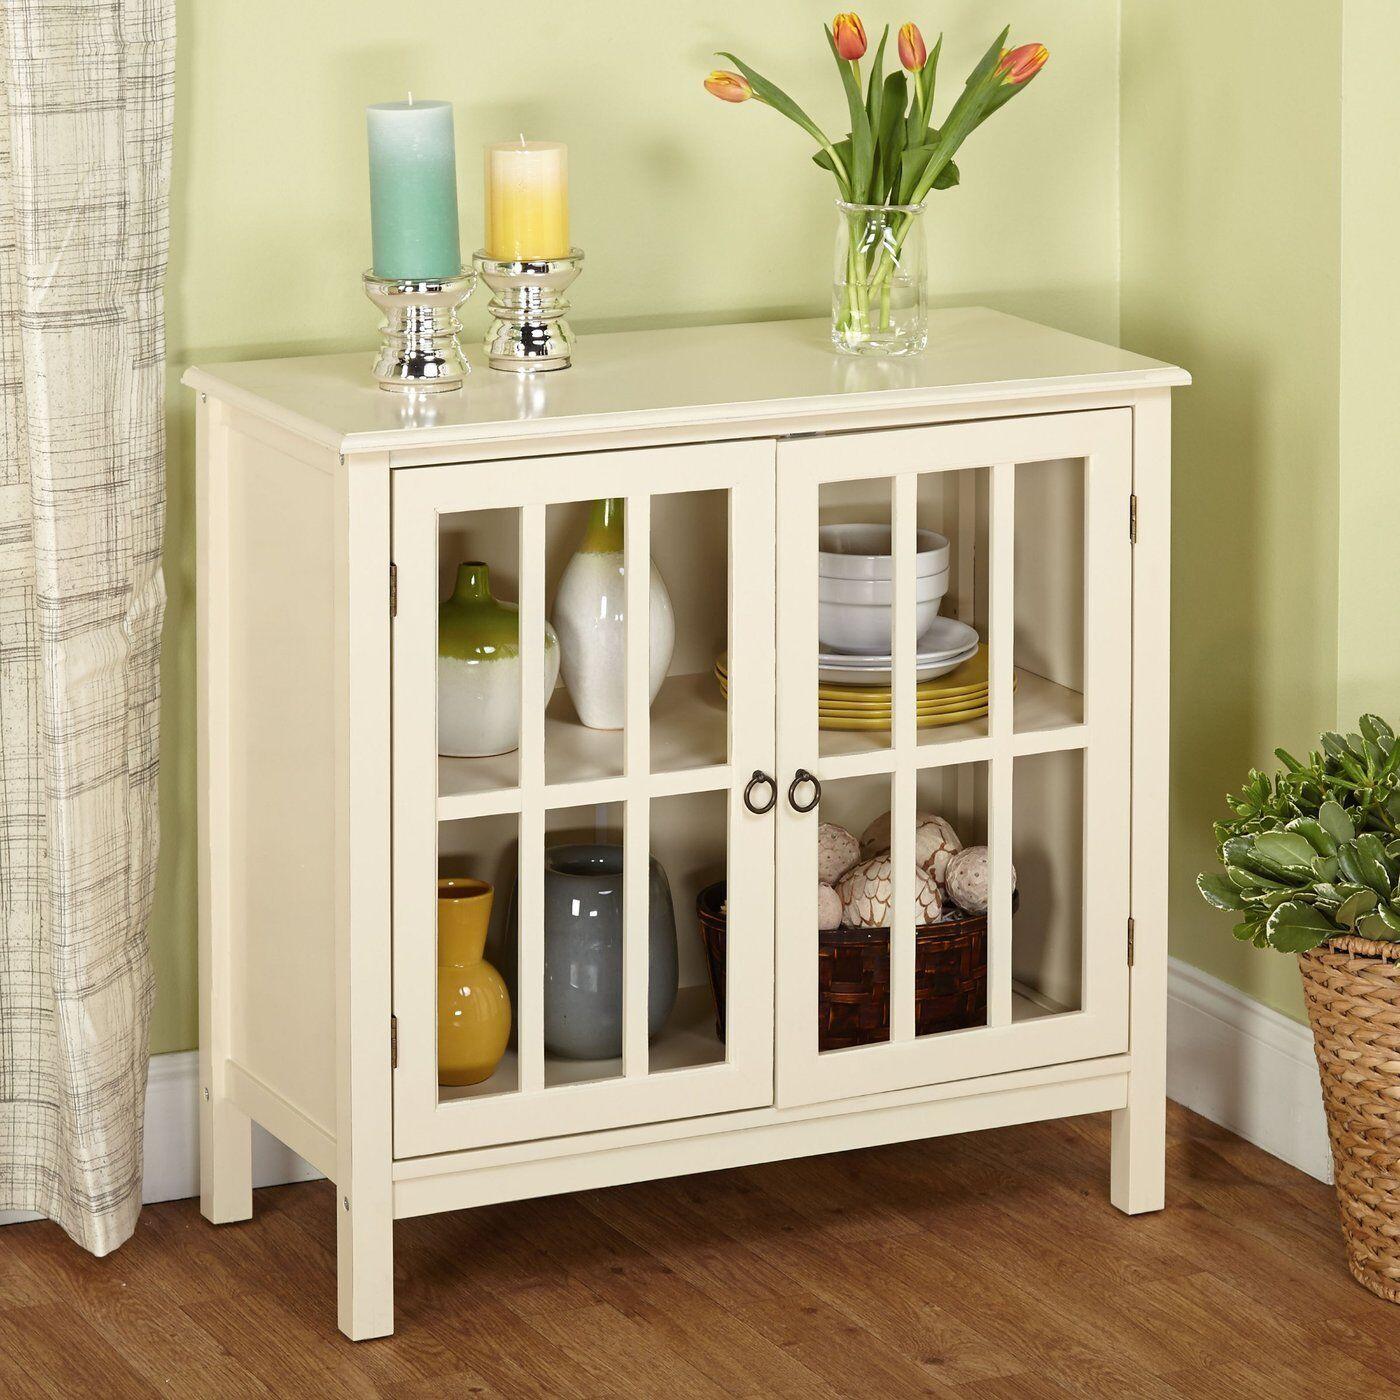 Modern Storage Cabinet White Sideboard Buffet Cupboard Pantry Kitchen Furniture EBay